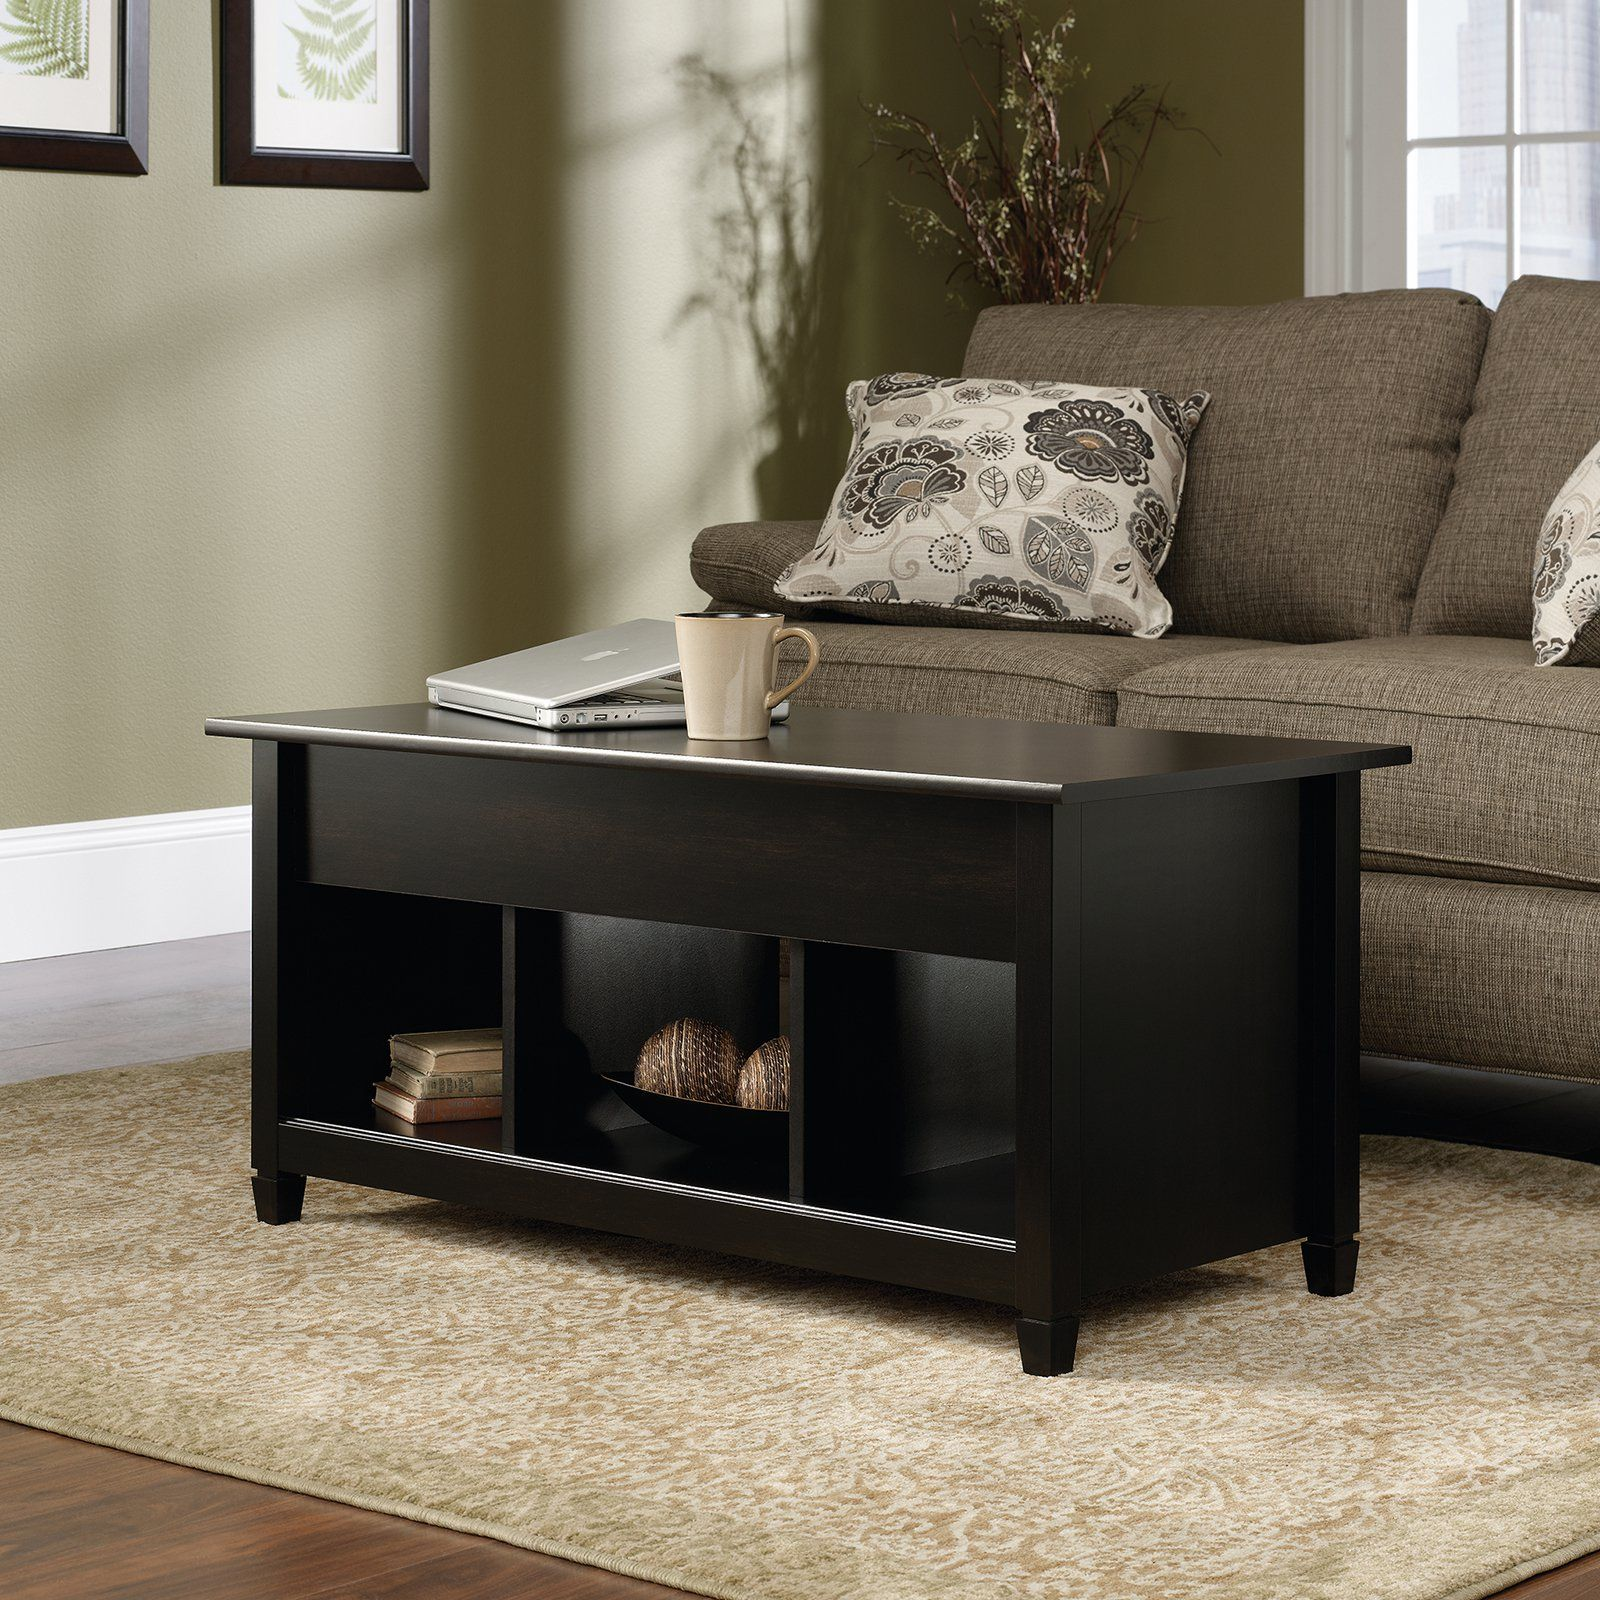 Sauder Edge Water Lift Top Coffee Table Coffee Table Coffee Table With Storage Cool Coffee Tables [ 1600 x 1600 Pixel ]